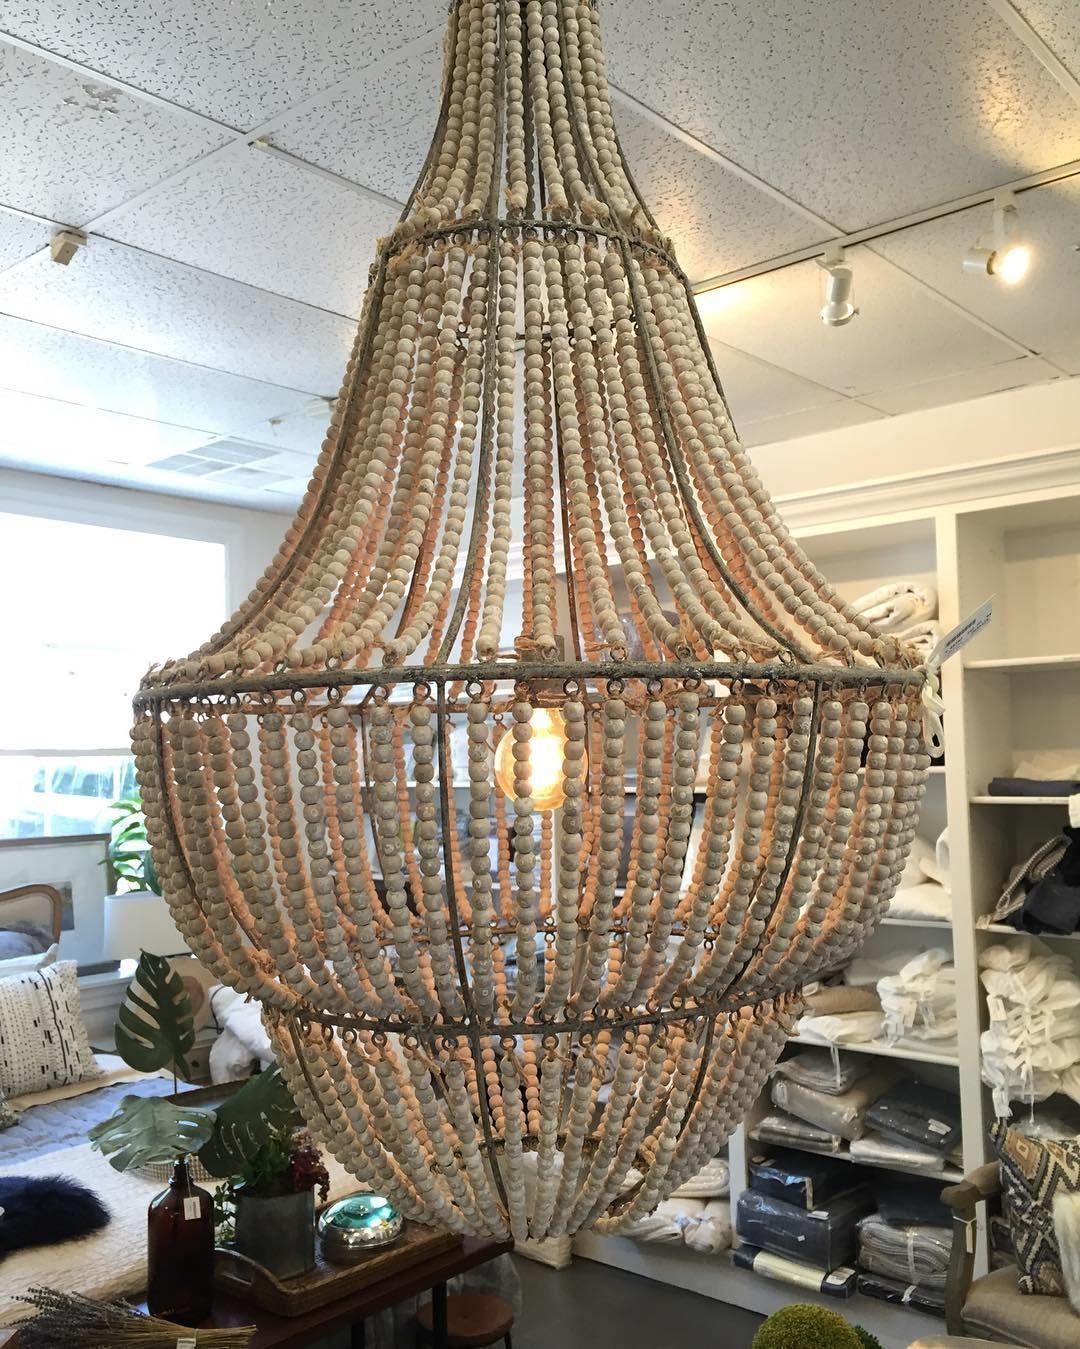 Beaded chandelier - huge statement lighting makes for a great dining or living focal point. #lighting #lightingdesign #interiordesign #saltlakecity ... & Beaded chandelier - huge statement lighting makes for a great dining ...